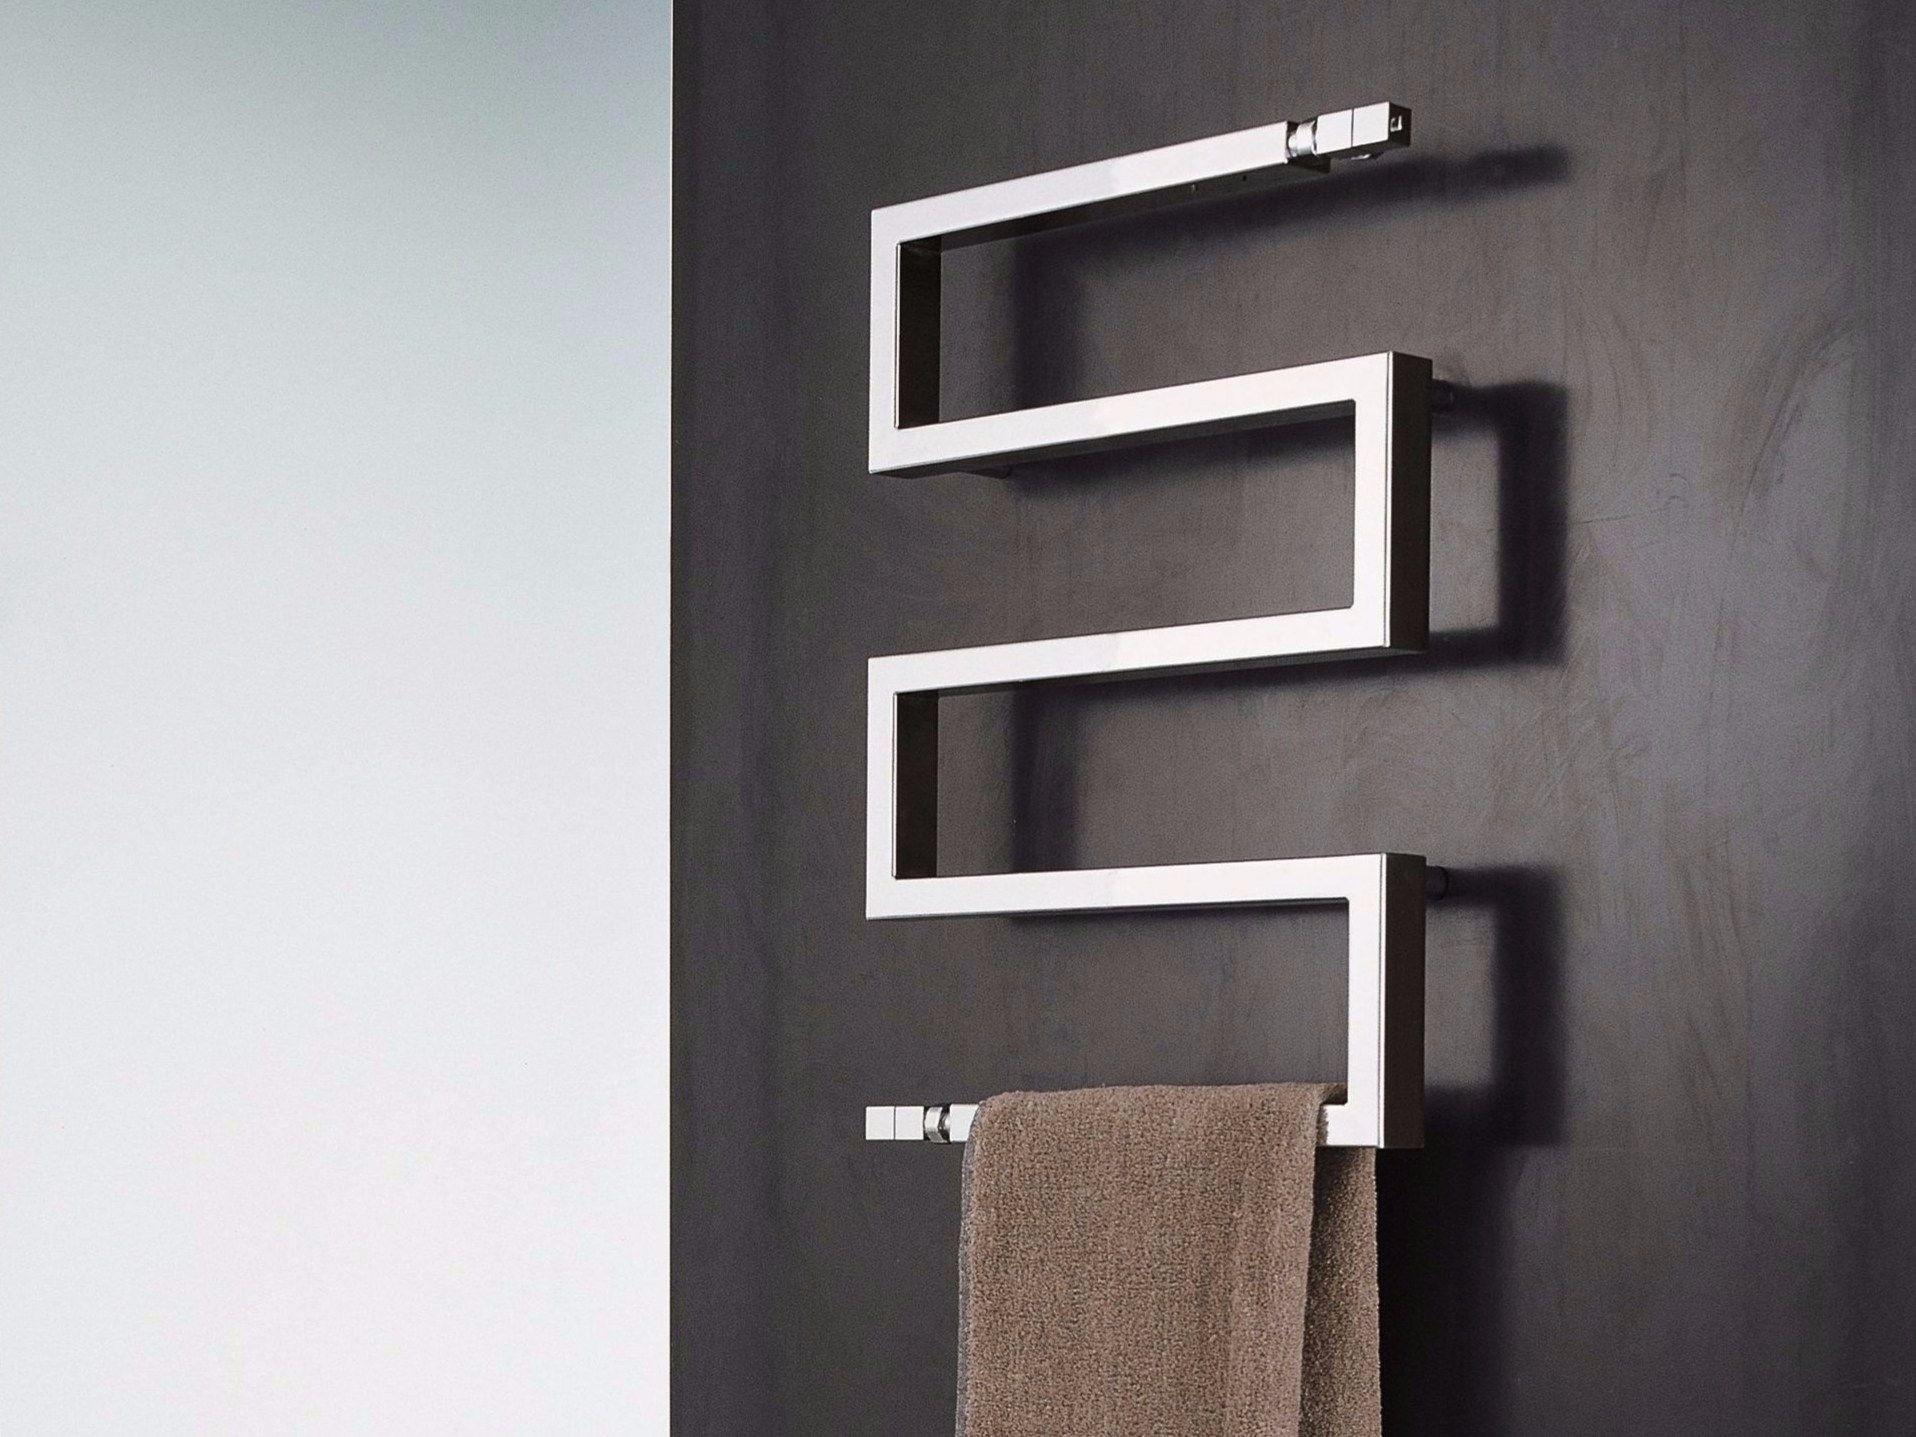 Wooden Towel Rail Clothes Stand Rack Bath Towel Holder Rails Natural /& White